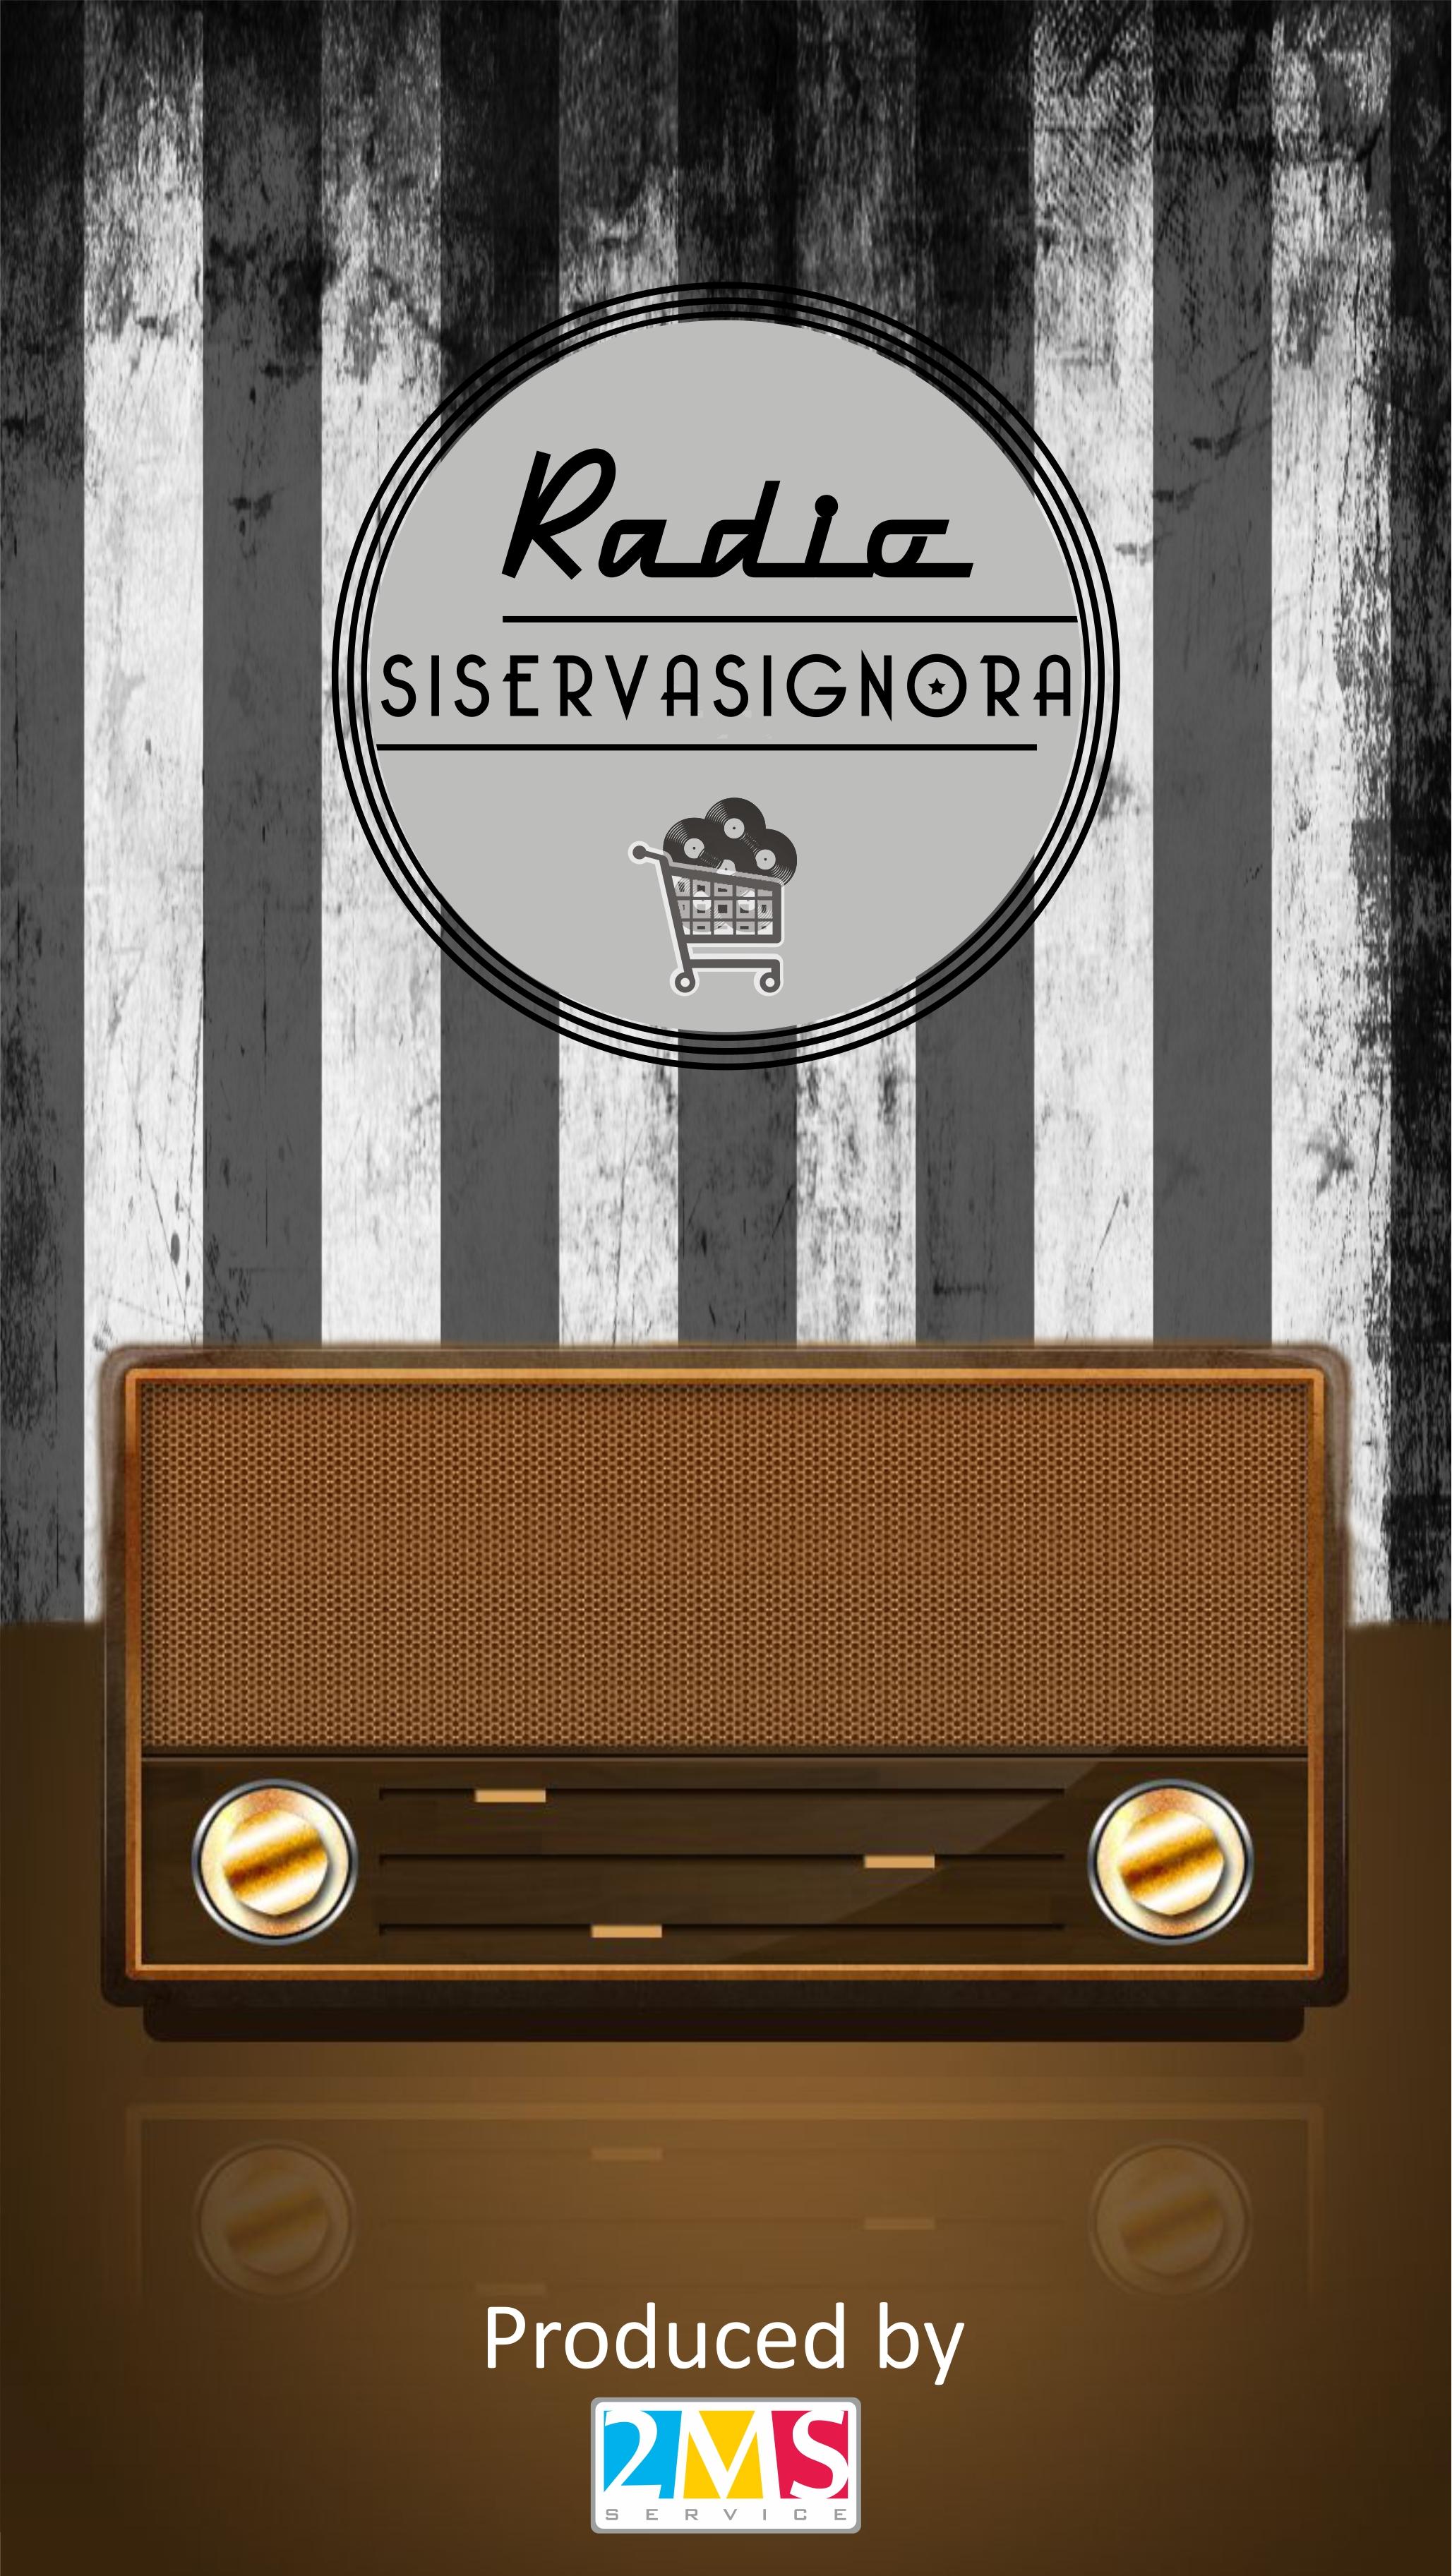 immagine-lancio-app-radio-si-serva-signora